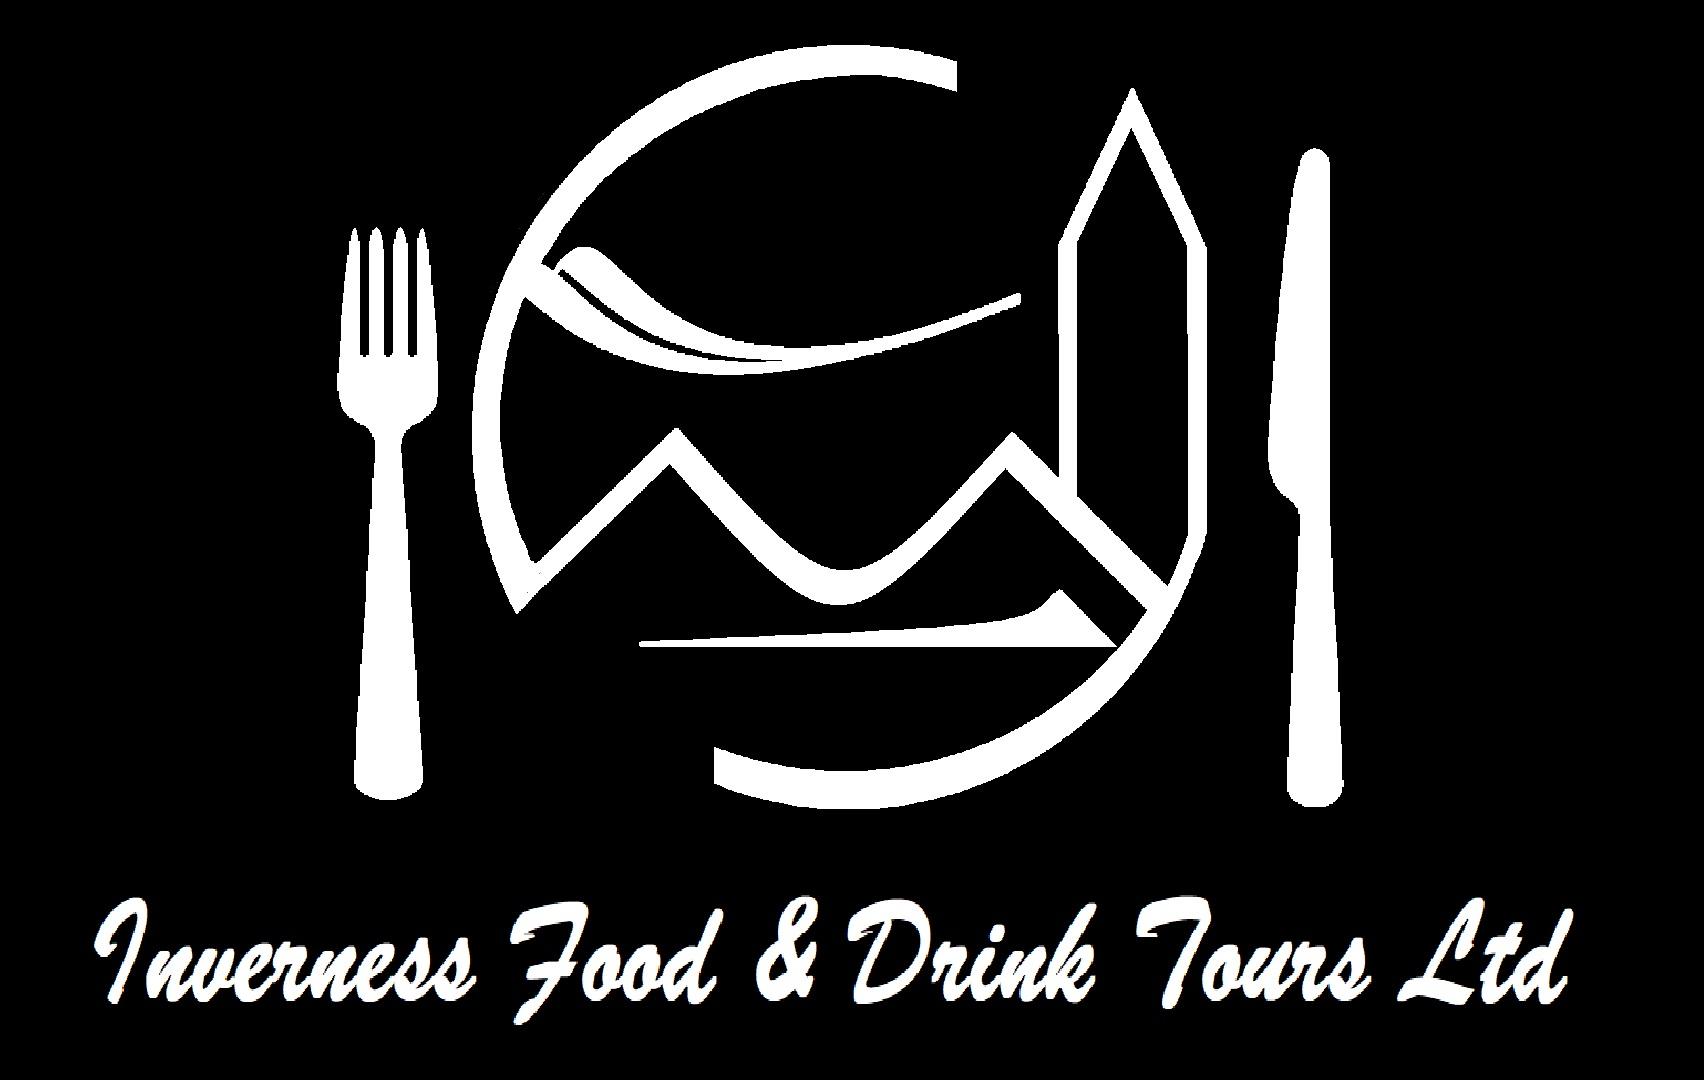 Logo (Black Background)